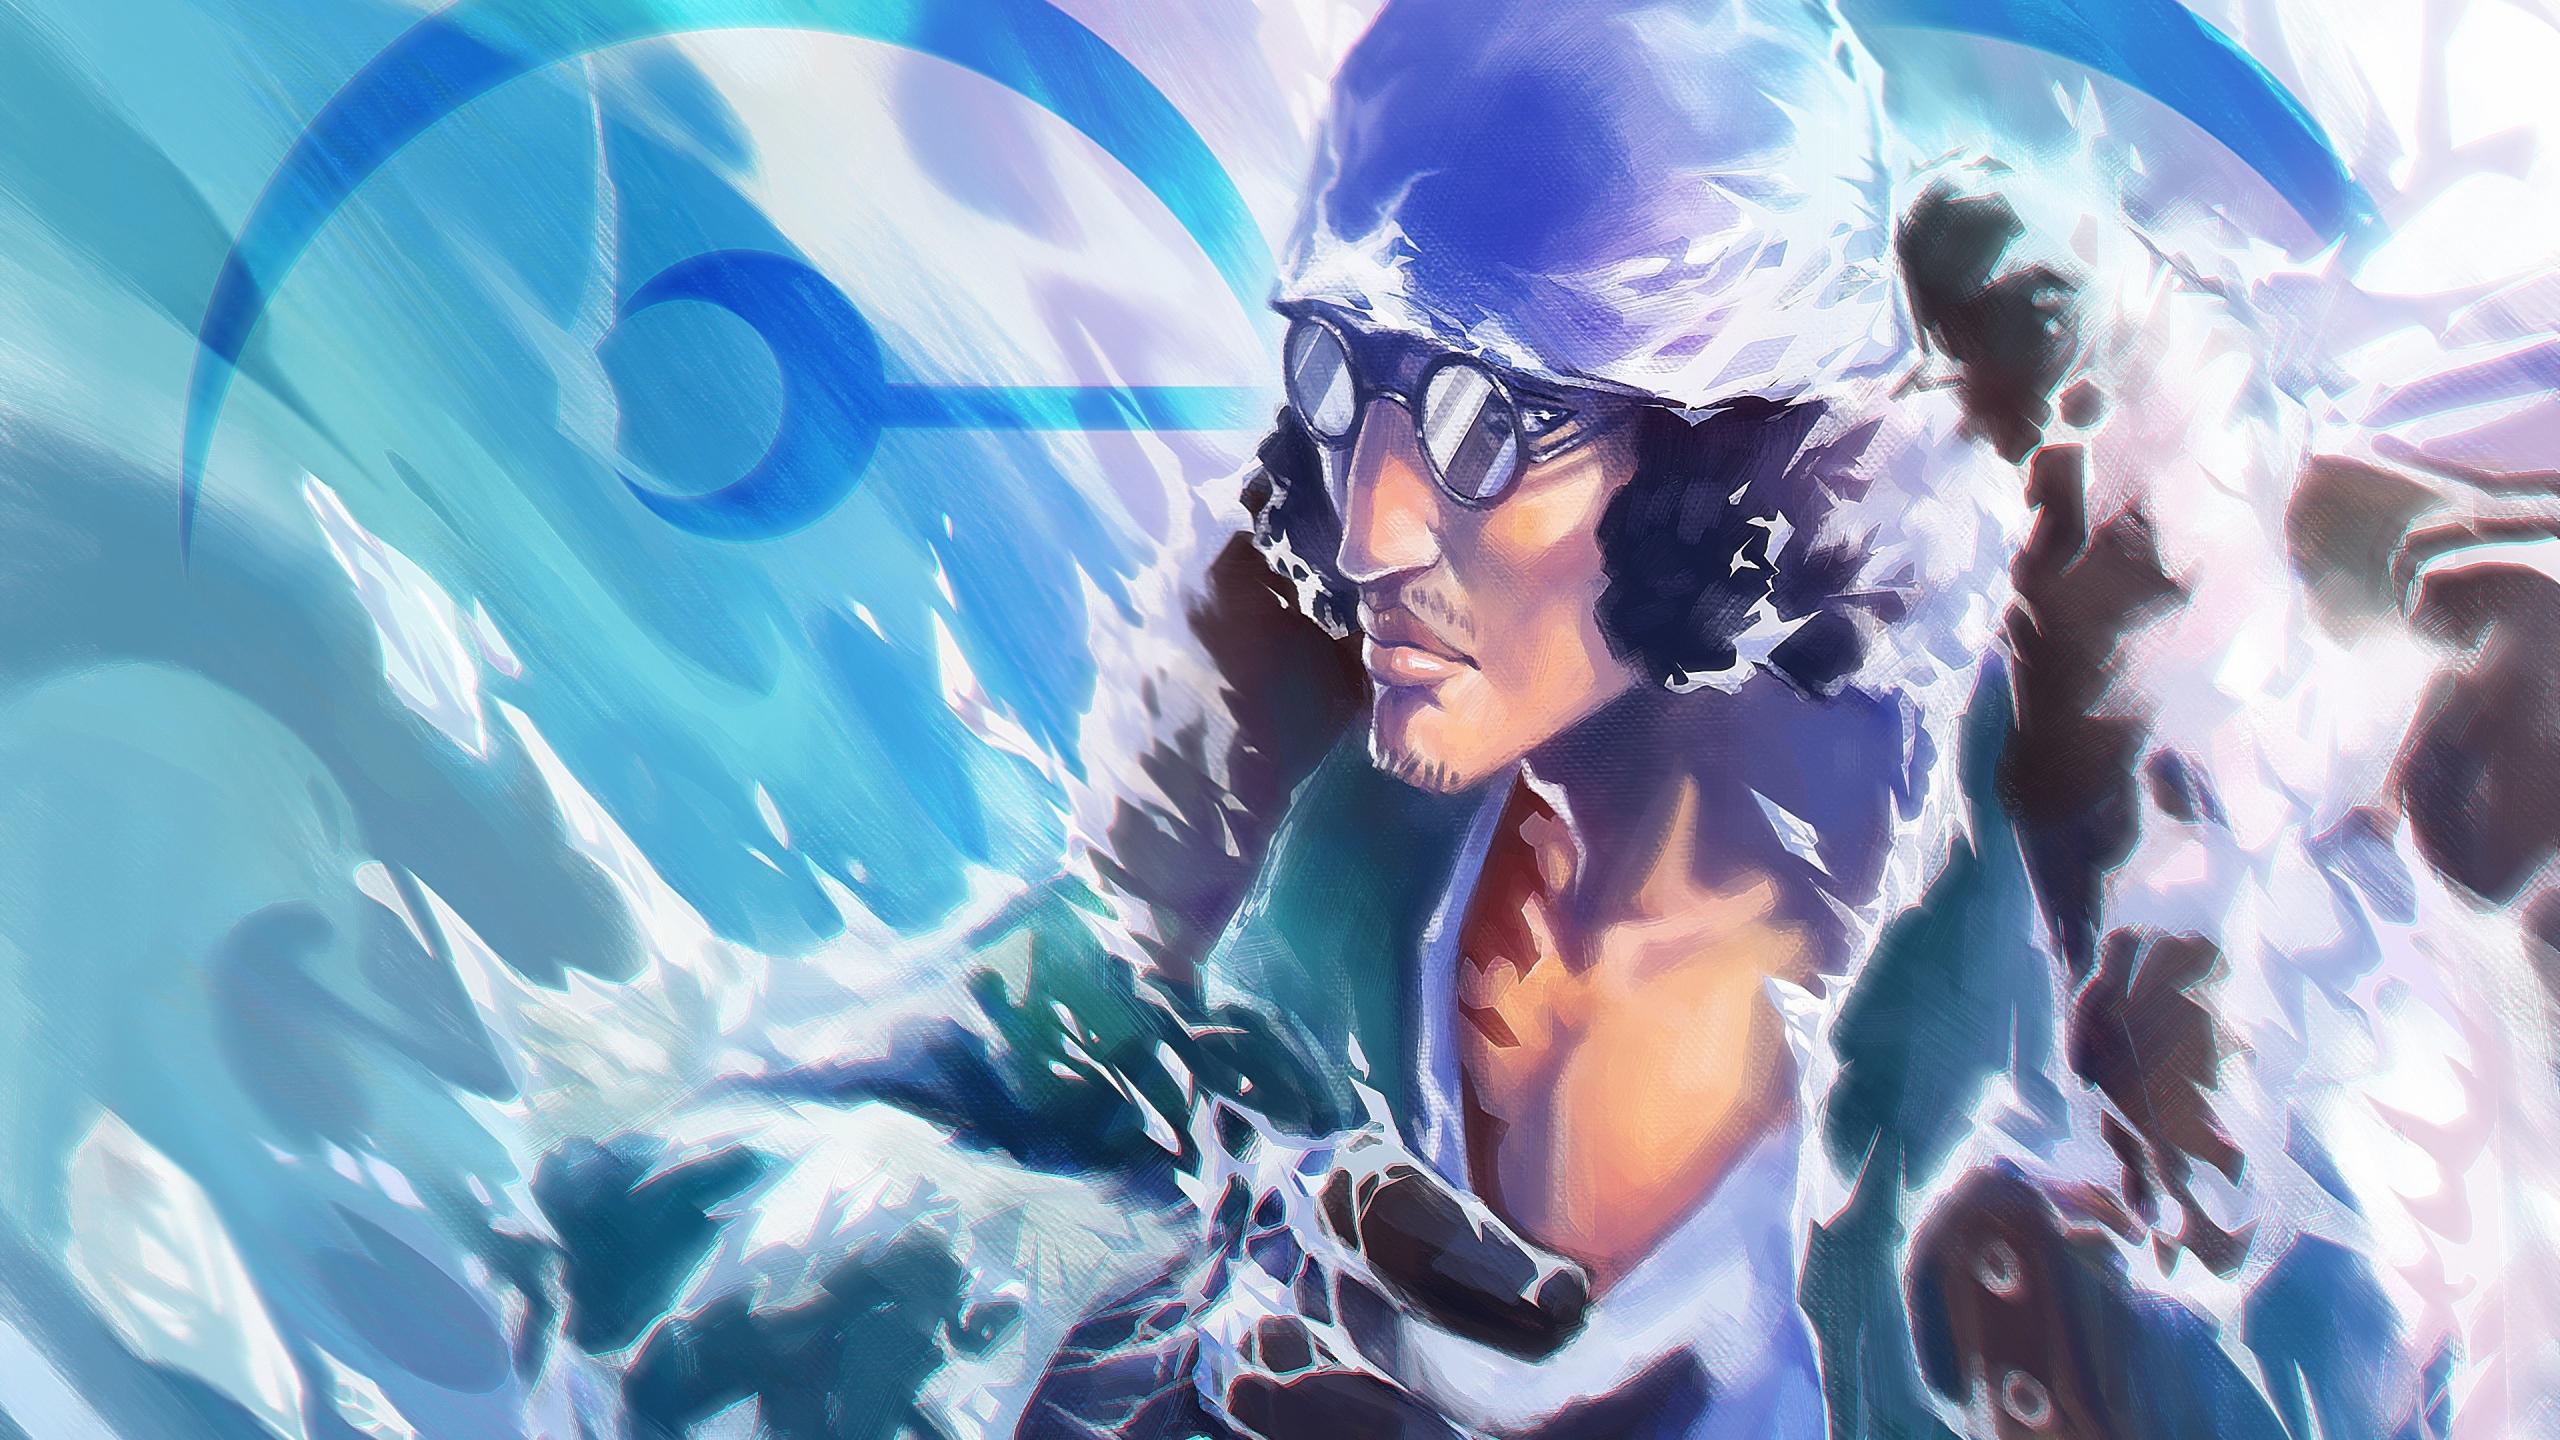 Download 2560x1440 Wallpaper Kuzan One Piece Anime Dual